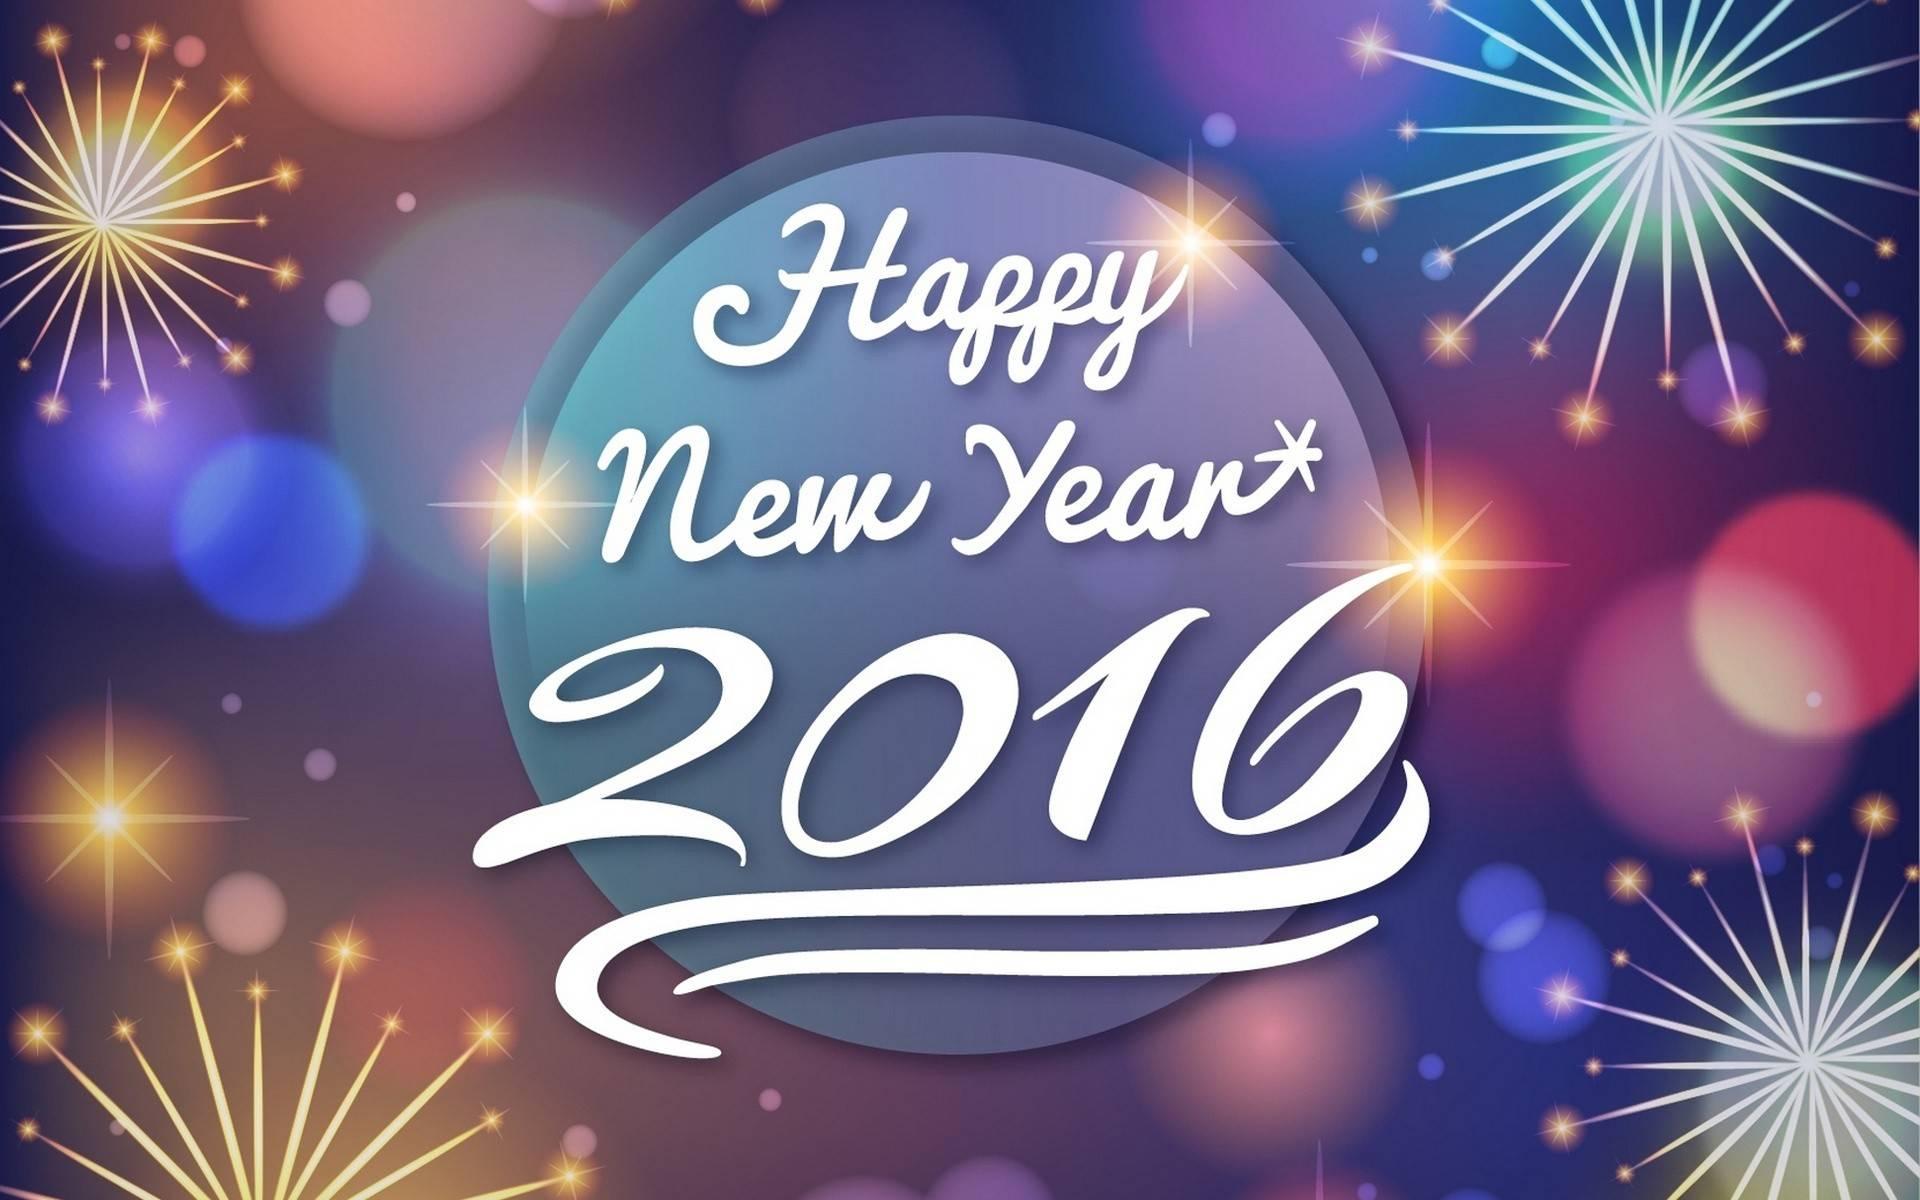 Поздравления 2016 картинки, тебе